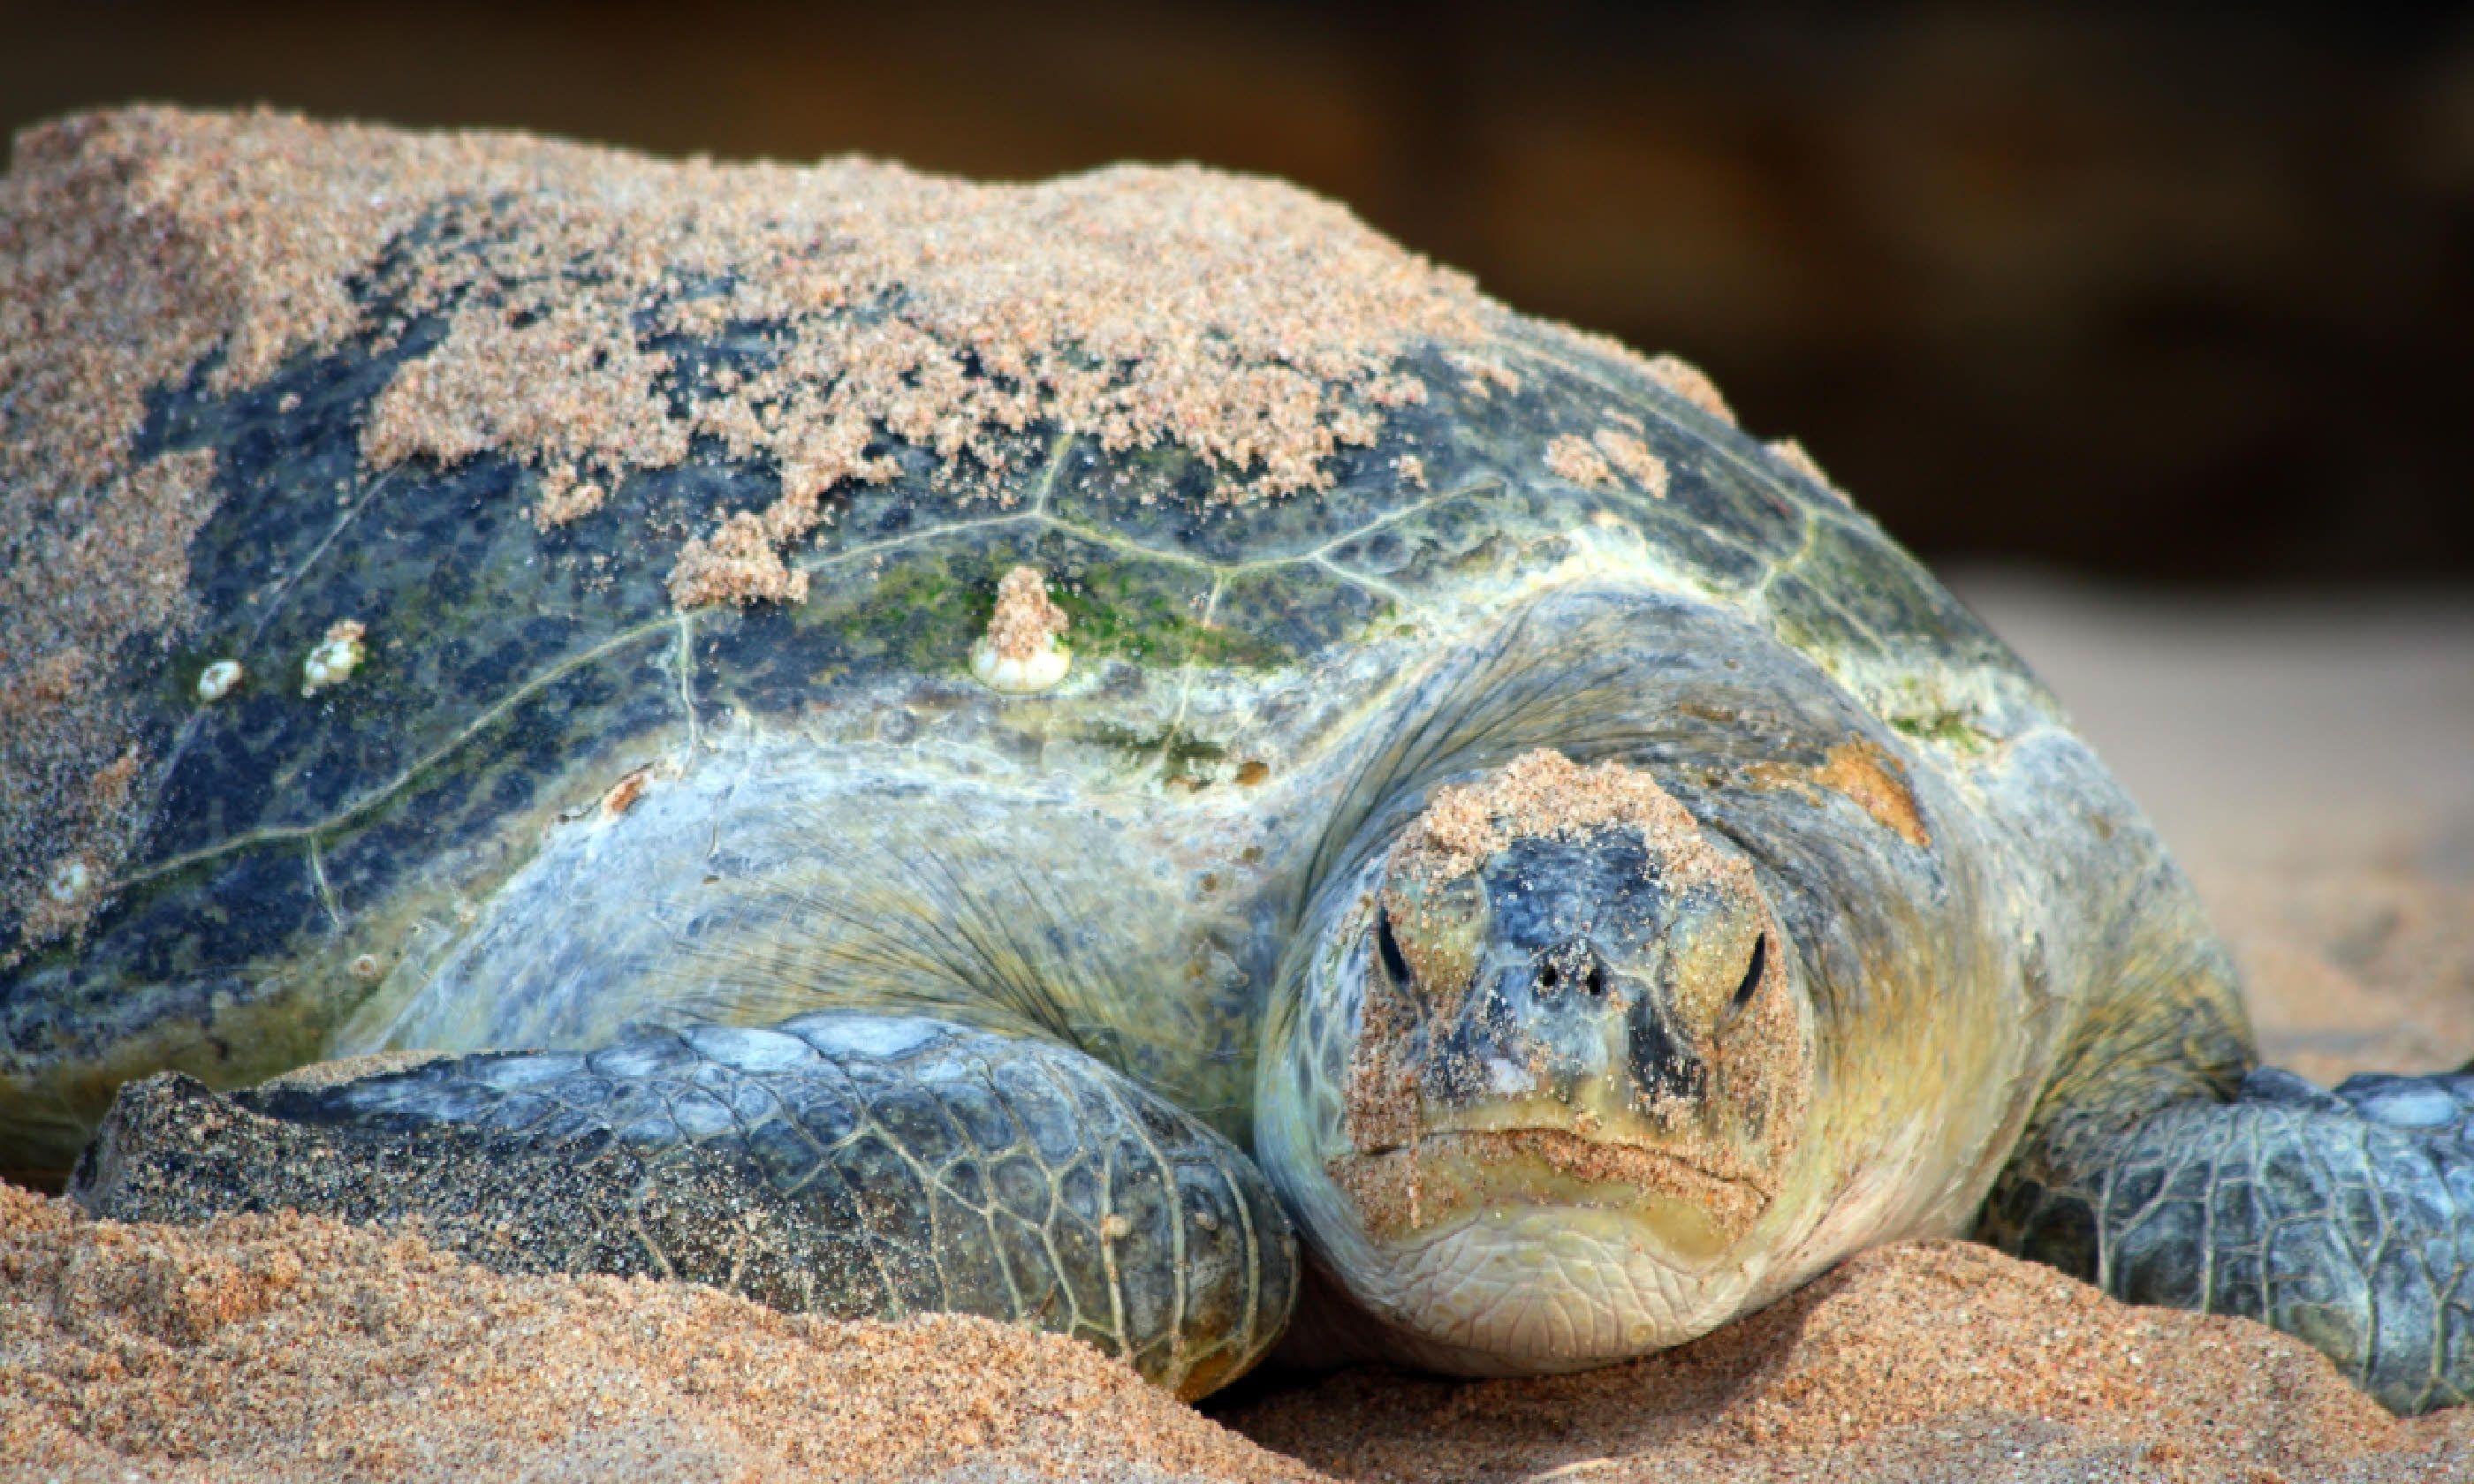 Green turtle at Ras al Jinz (Dreamstime)